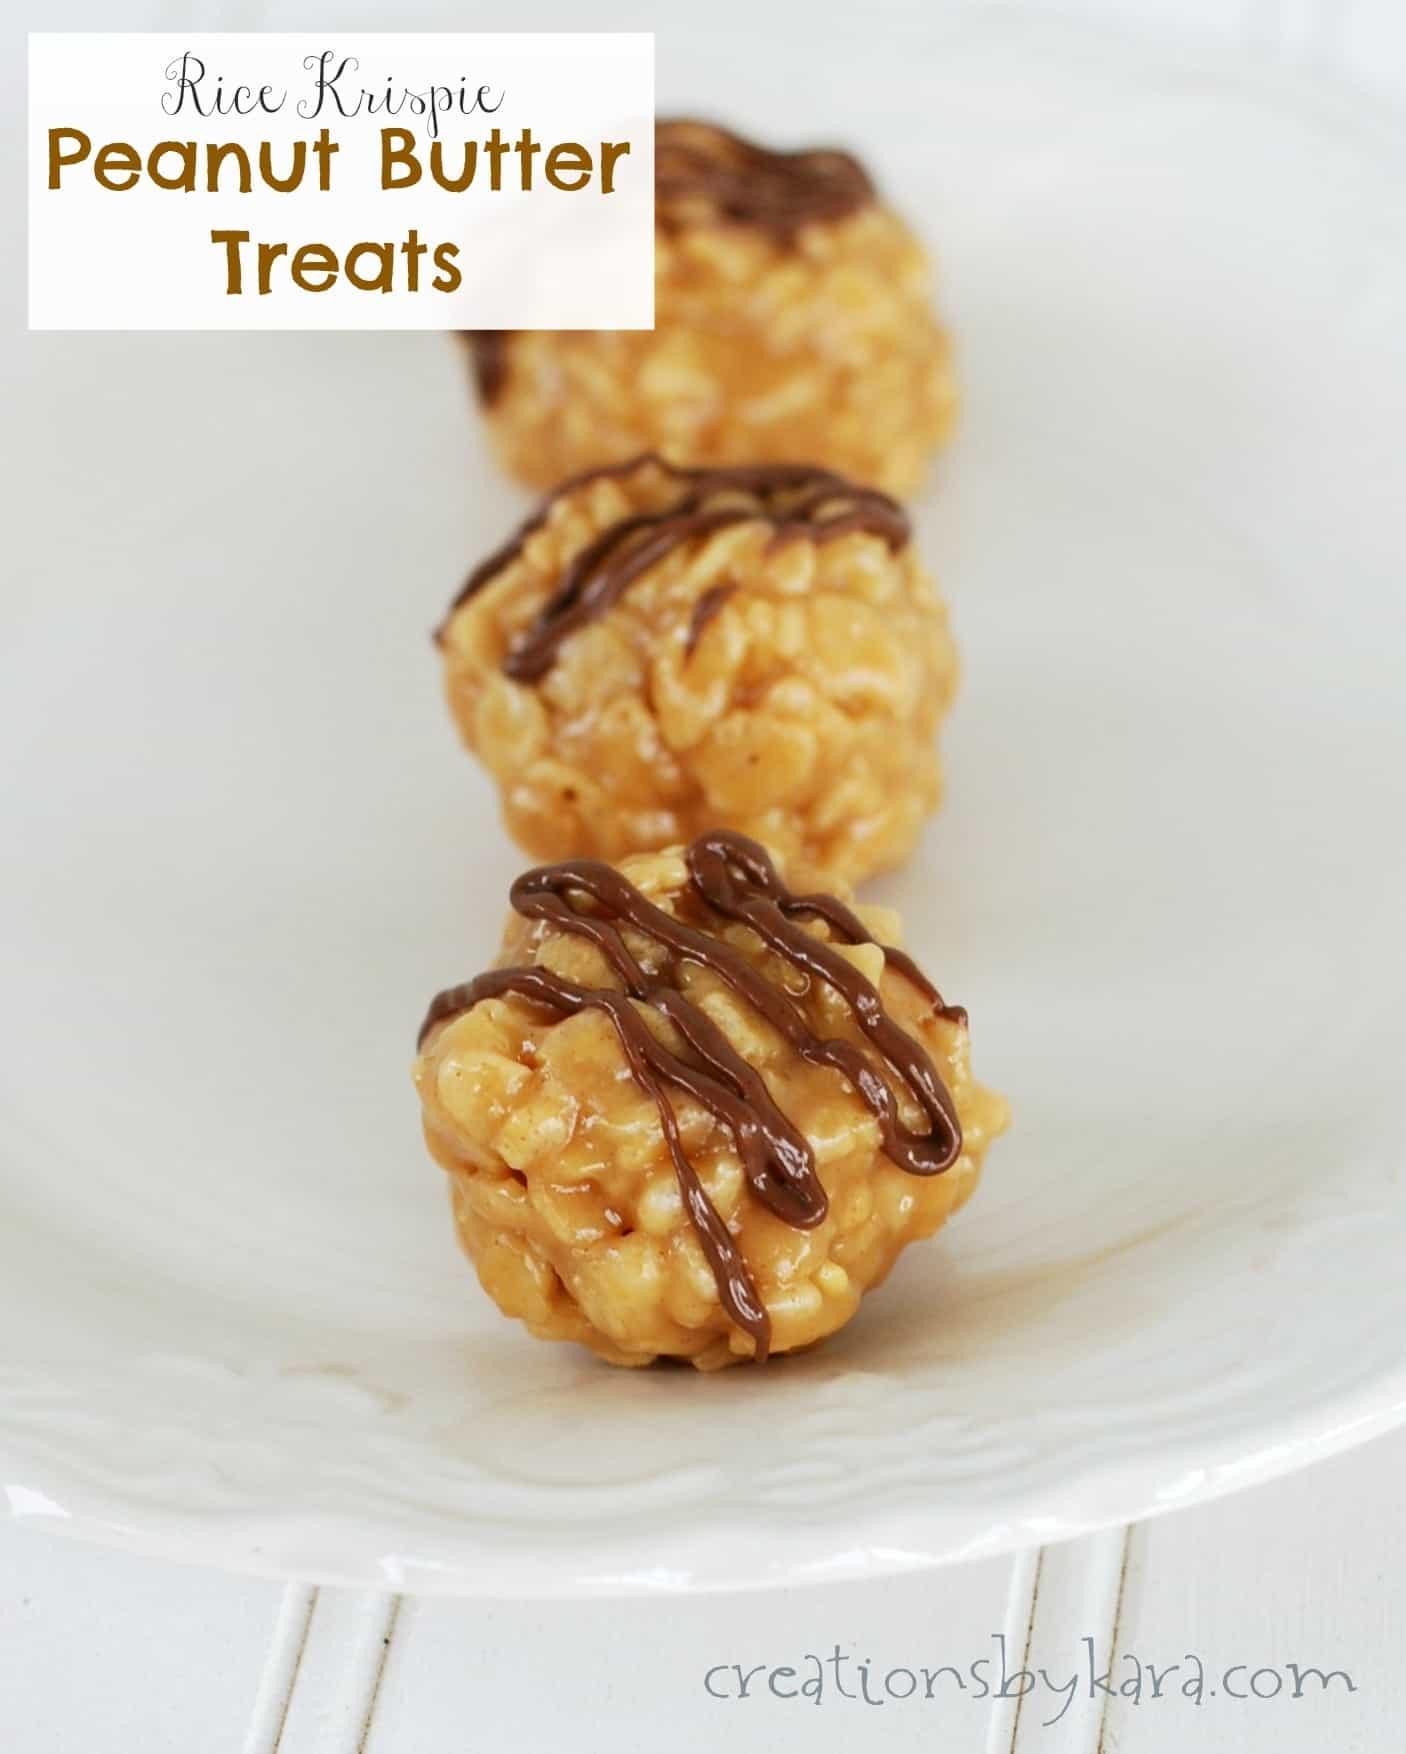 Easy Candy Recipe-- Rice Krispy Peanut Butter Treats